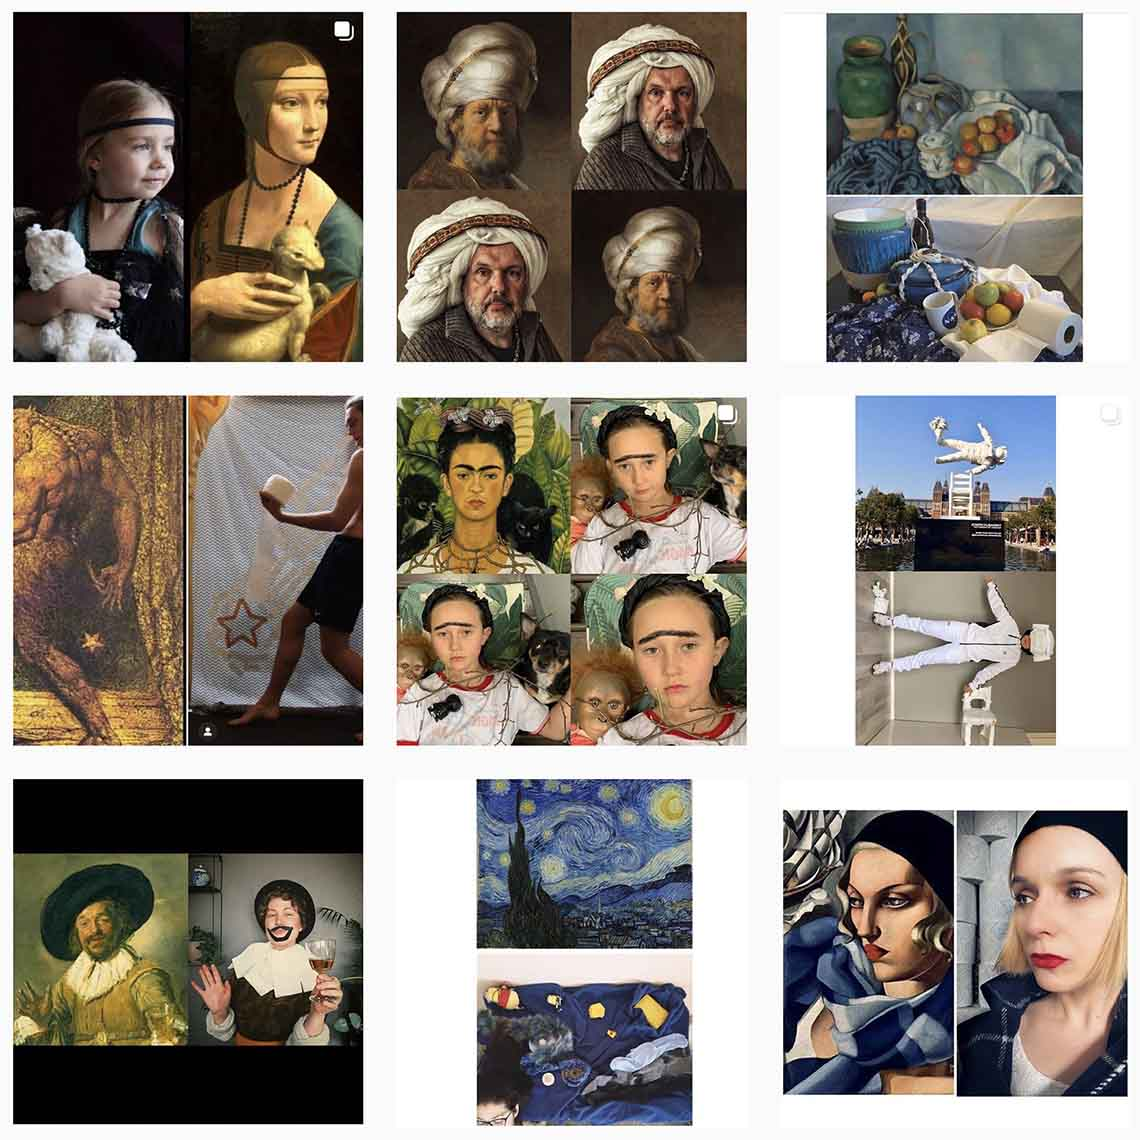 Tussen kunst en quarantaine op instagram - Travelvibe